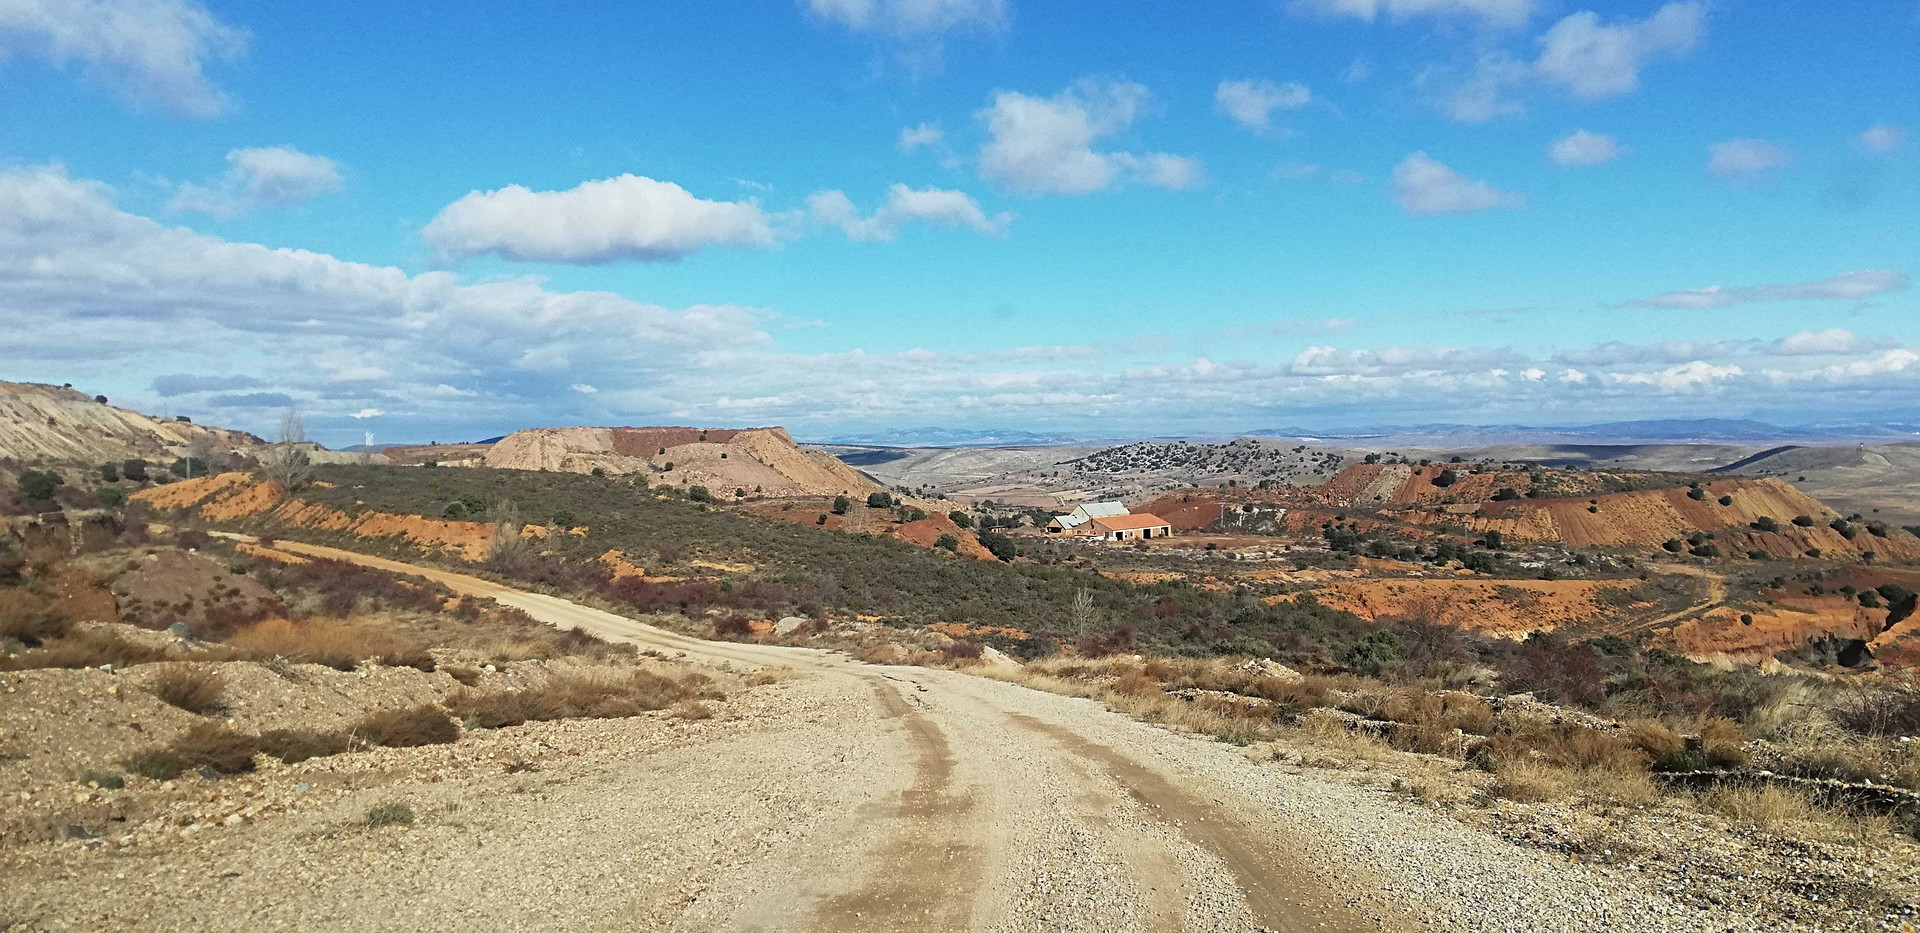 Paisaje minero / Mining landscape